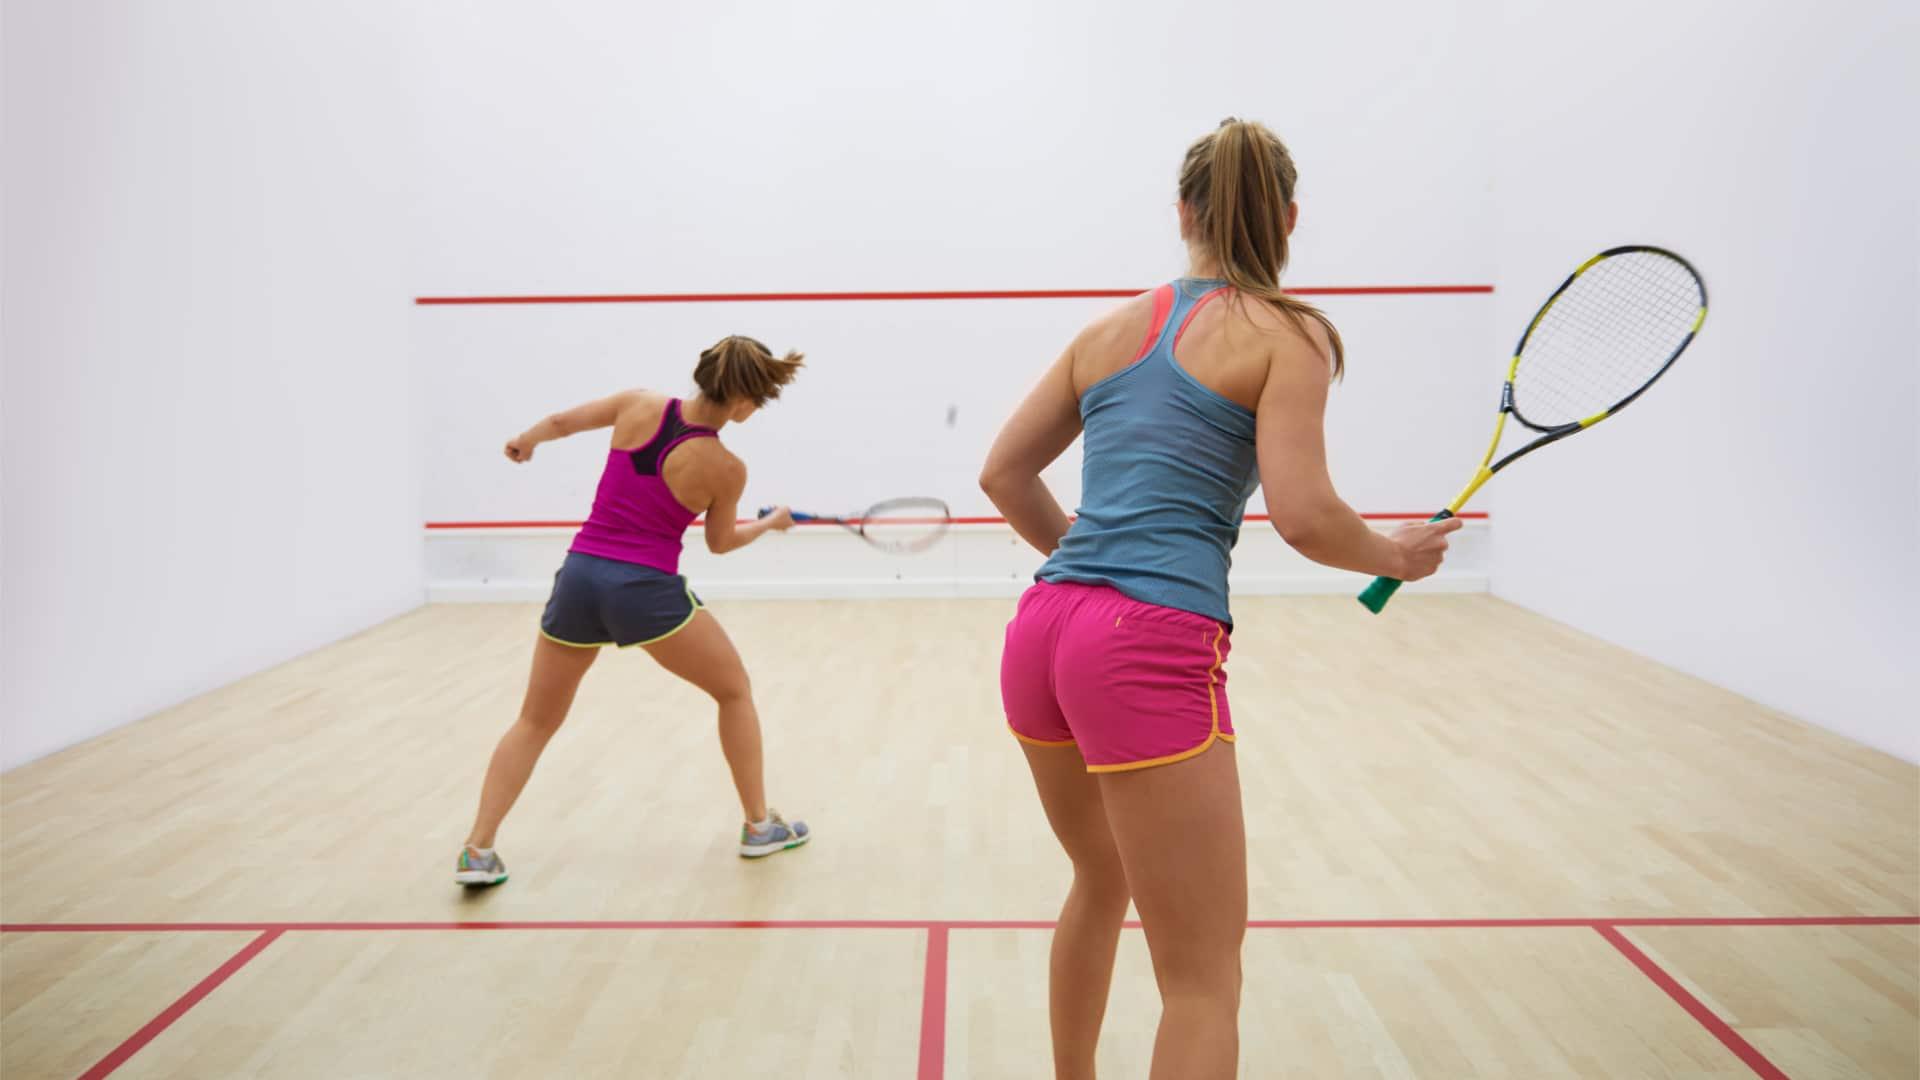 Rosters Sports Club Bar & Grill - Vernon BC - Squash & raquetball - 1